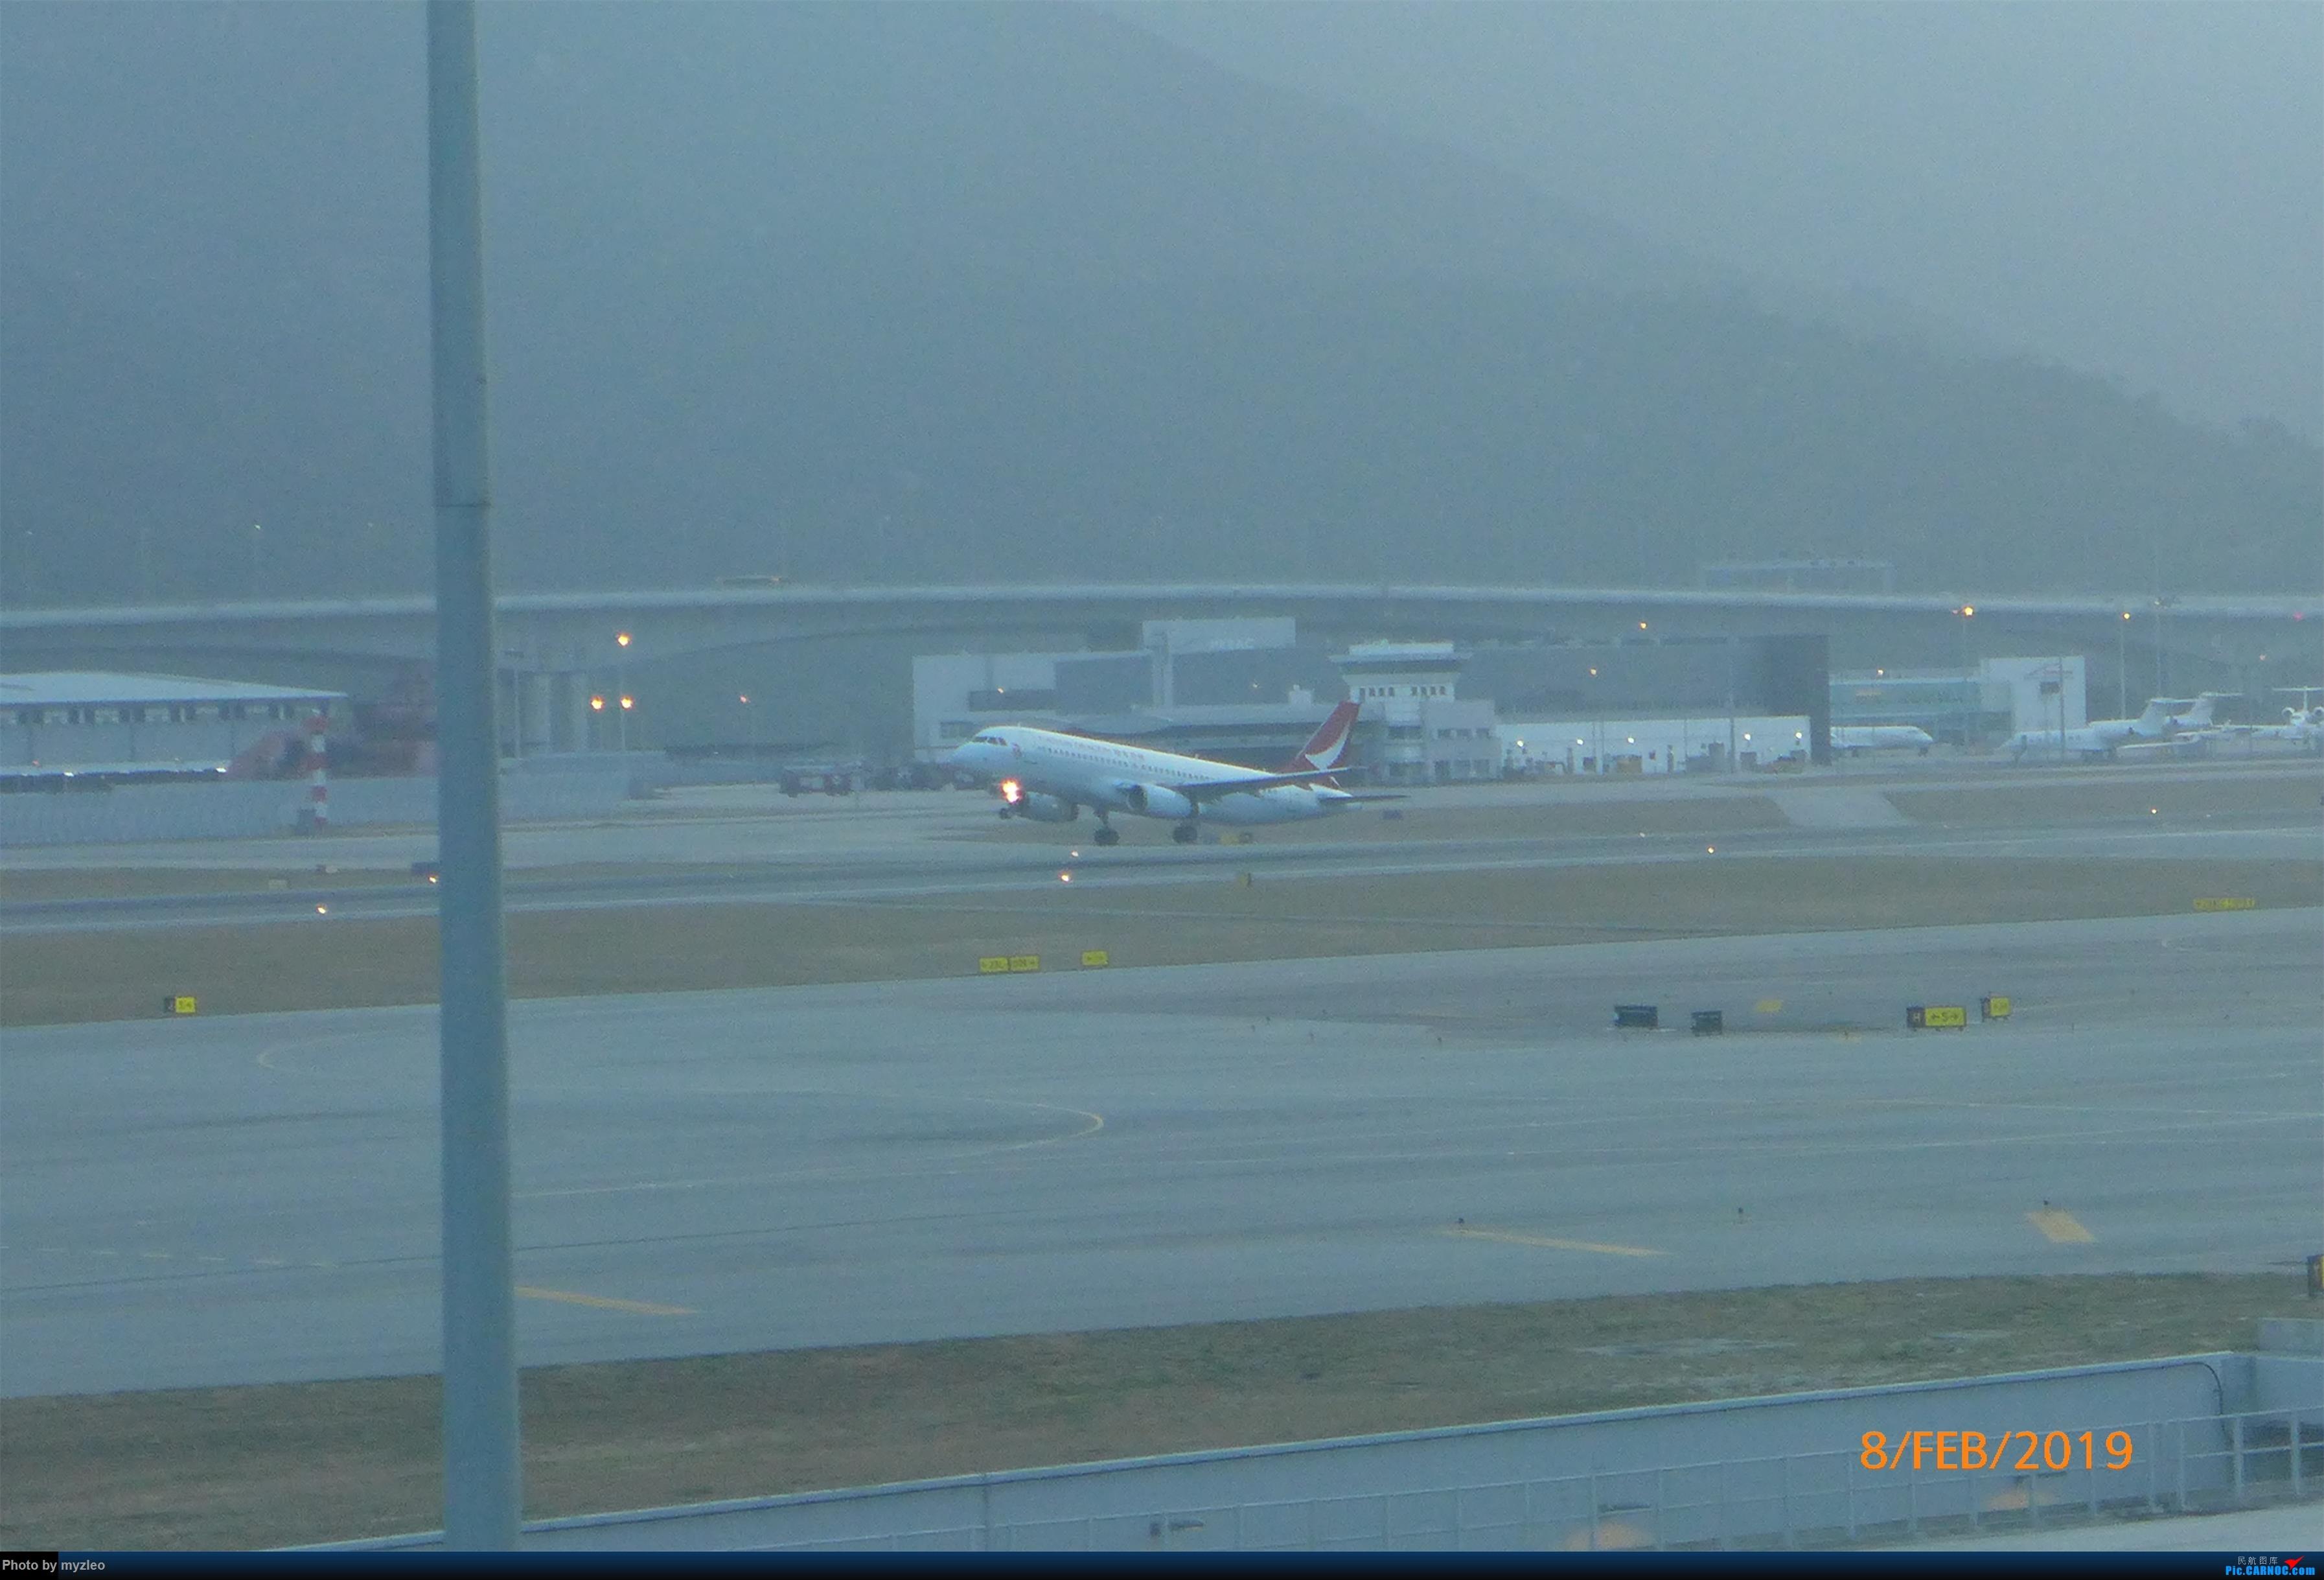 Re:[原创]【myzleo的游记4.5】十年之约(5)在香港的最后一天,搭乘港航333回沪 AIRBUS A320-200  中国香港国际机场